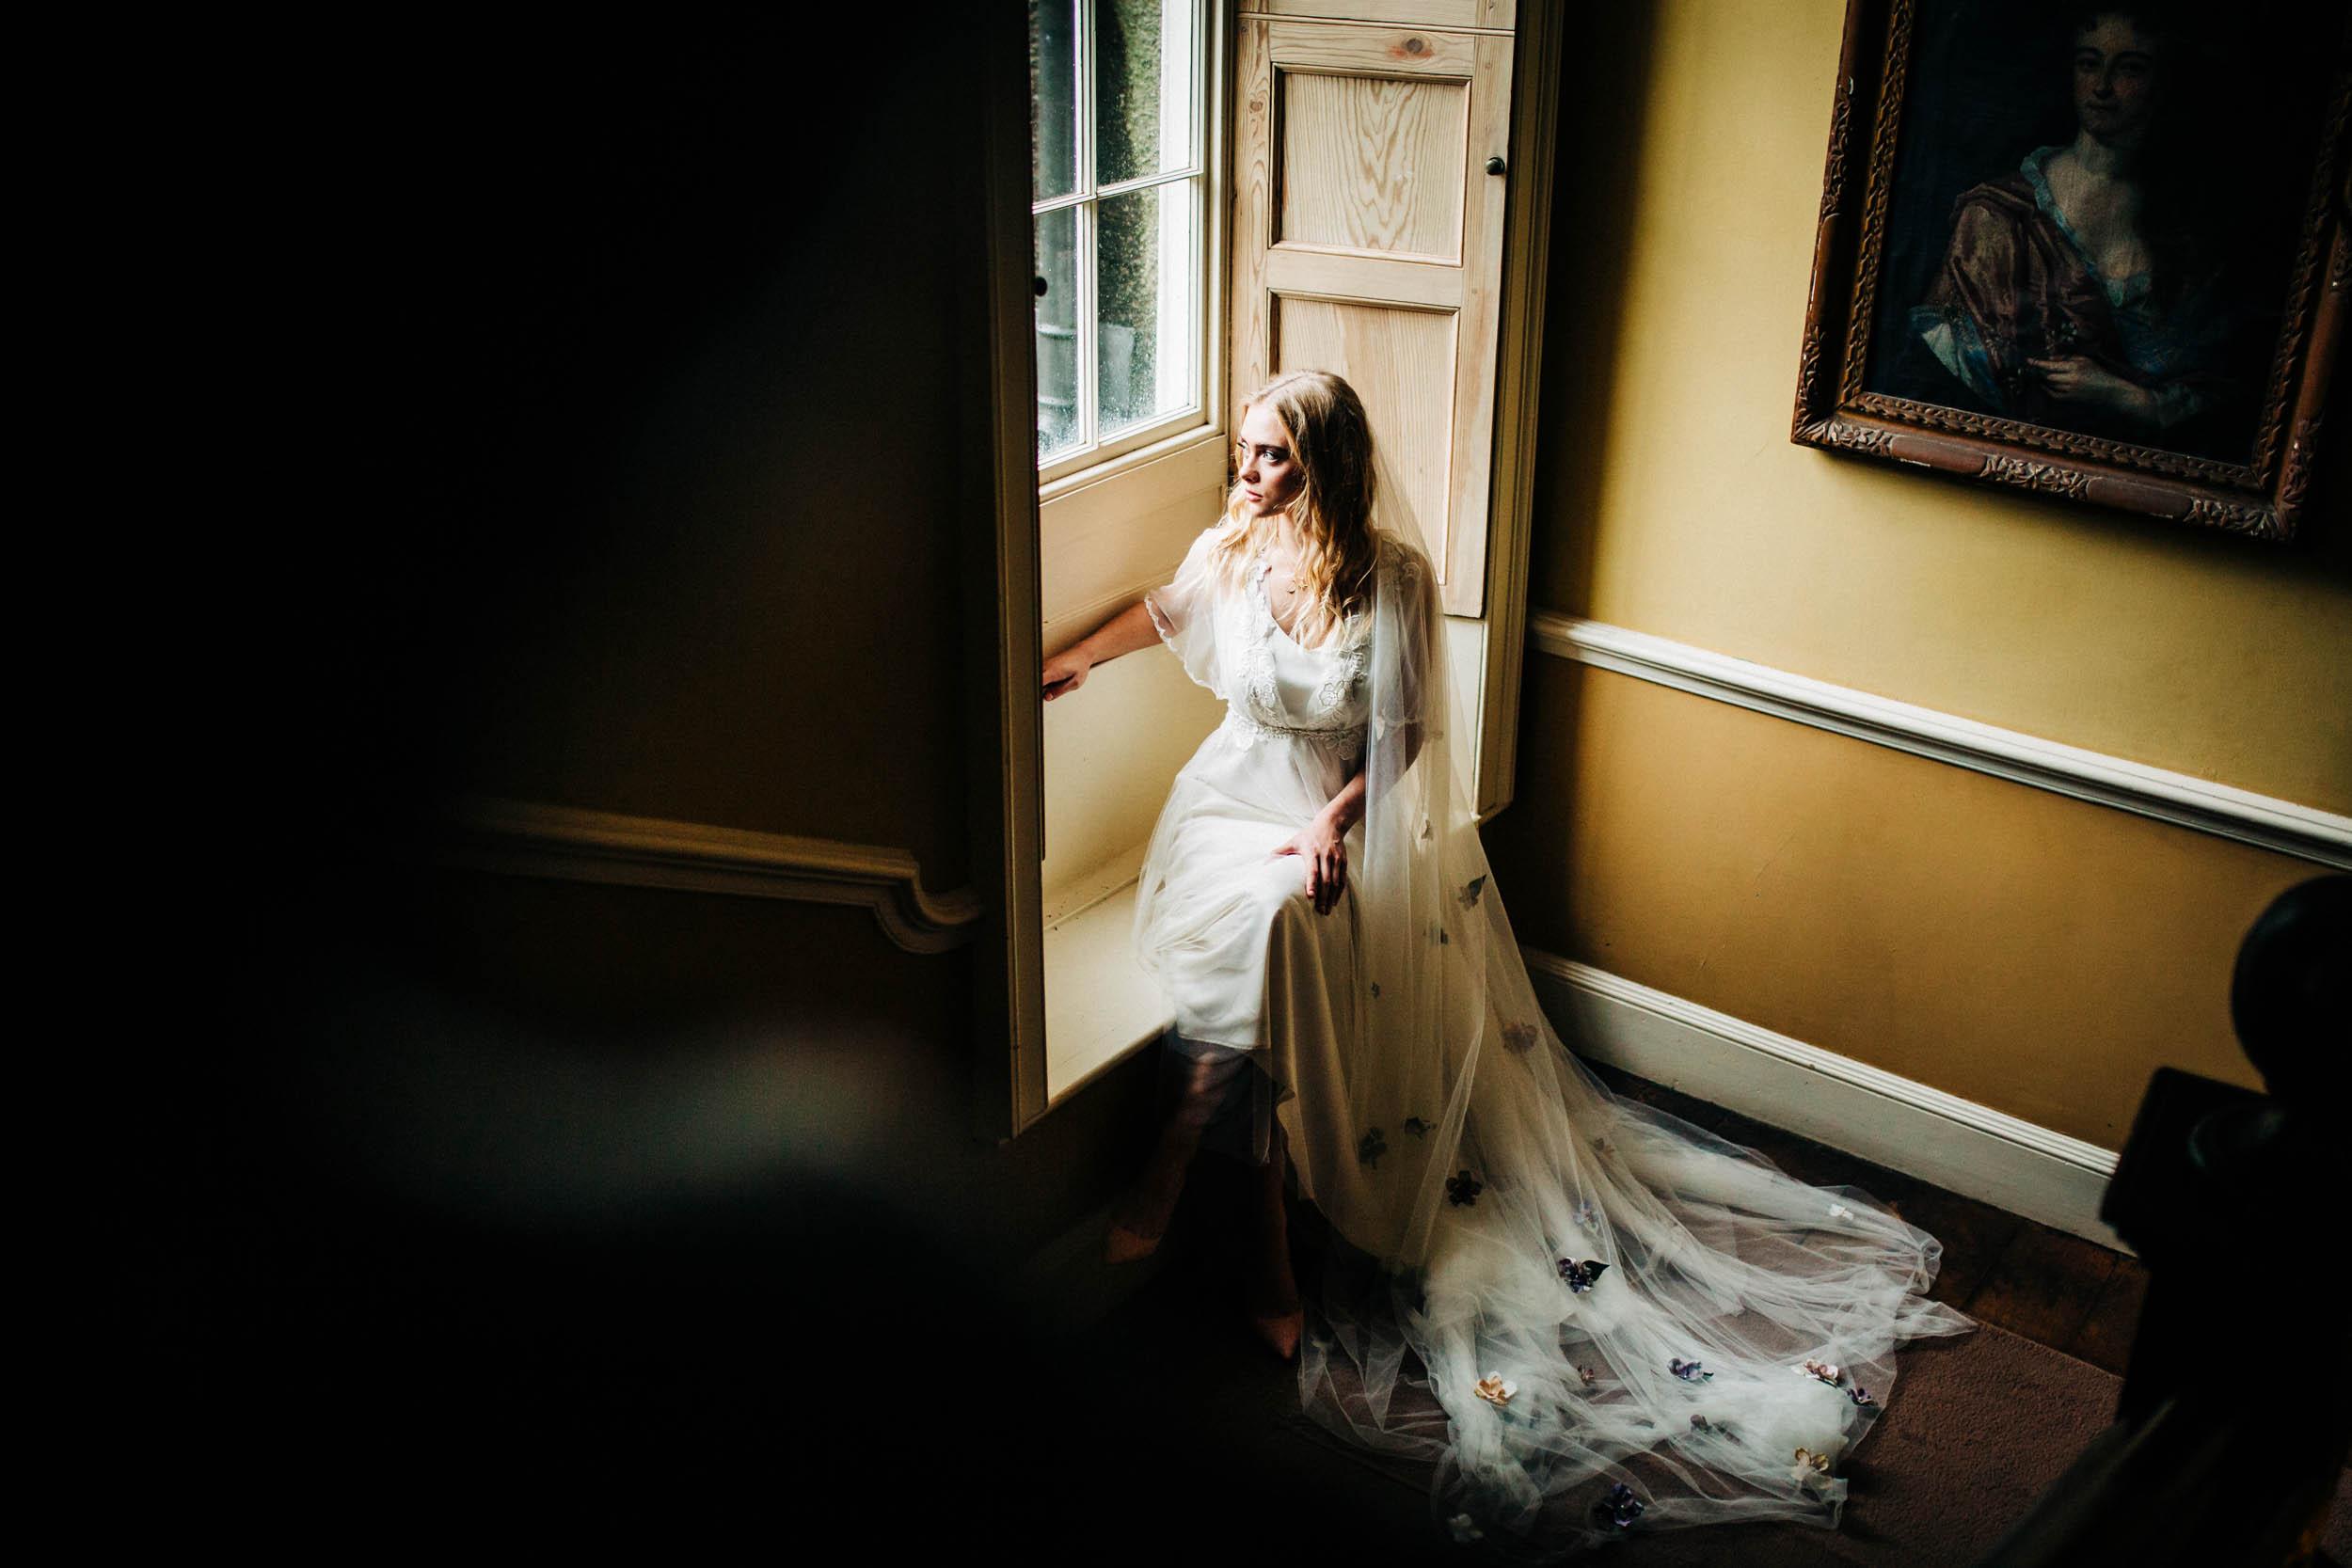 Alex_Sedgmond_Photography-SouthWalesWeddingPhotography-Wedding-Photographer-Cardiff-258.jpg